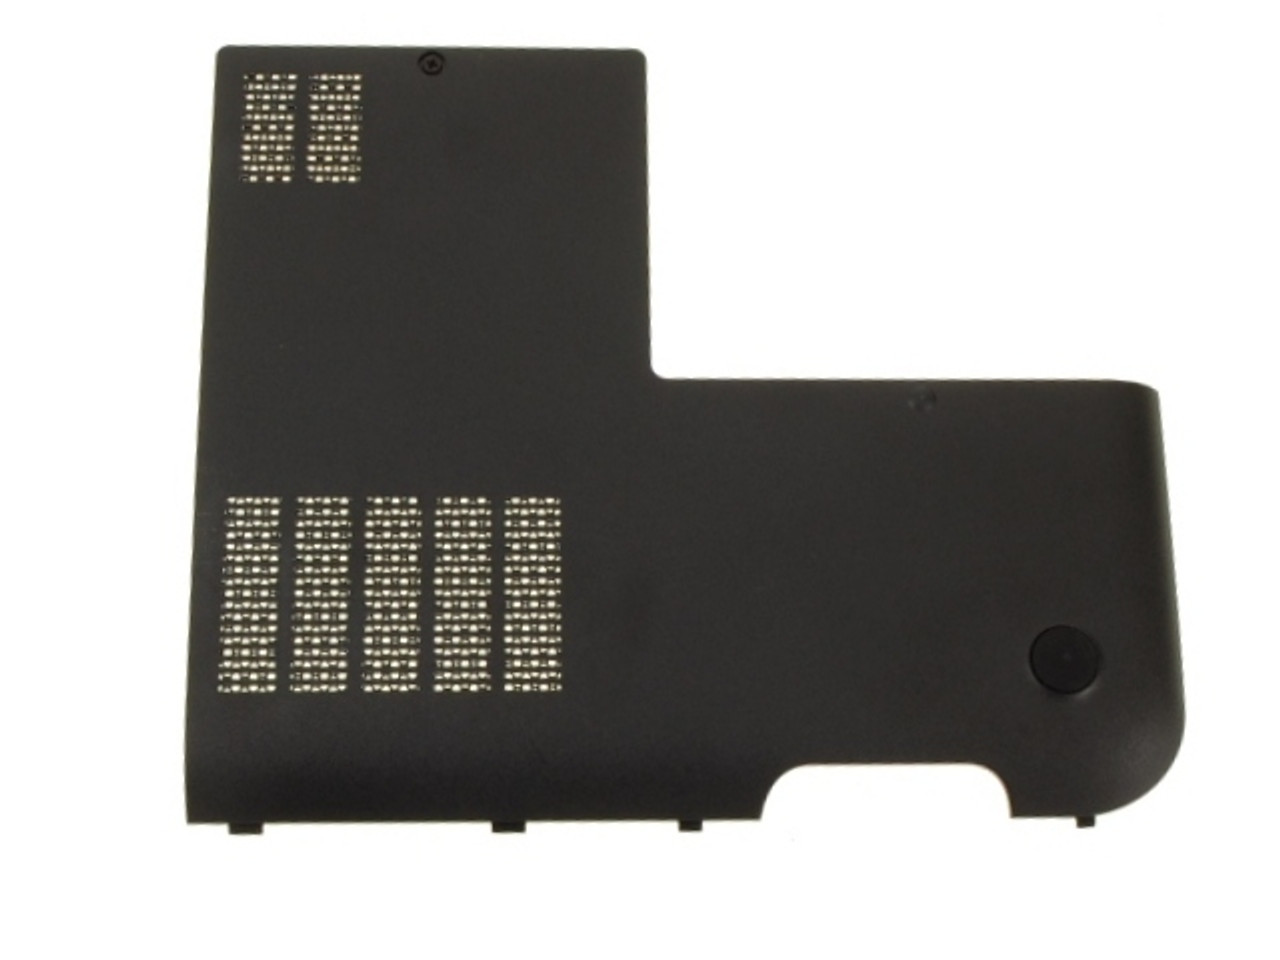 Dell Inspiron 14R 5420 / 7520 Bottom Base Access Panel Door - WT4VC